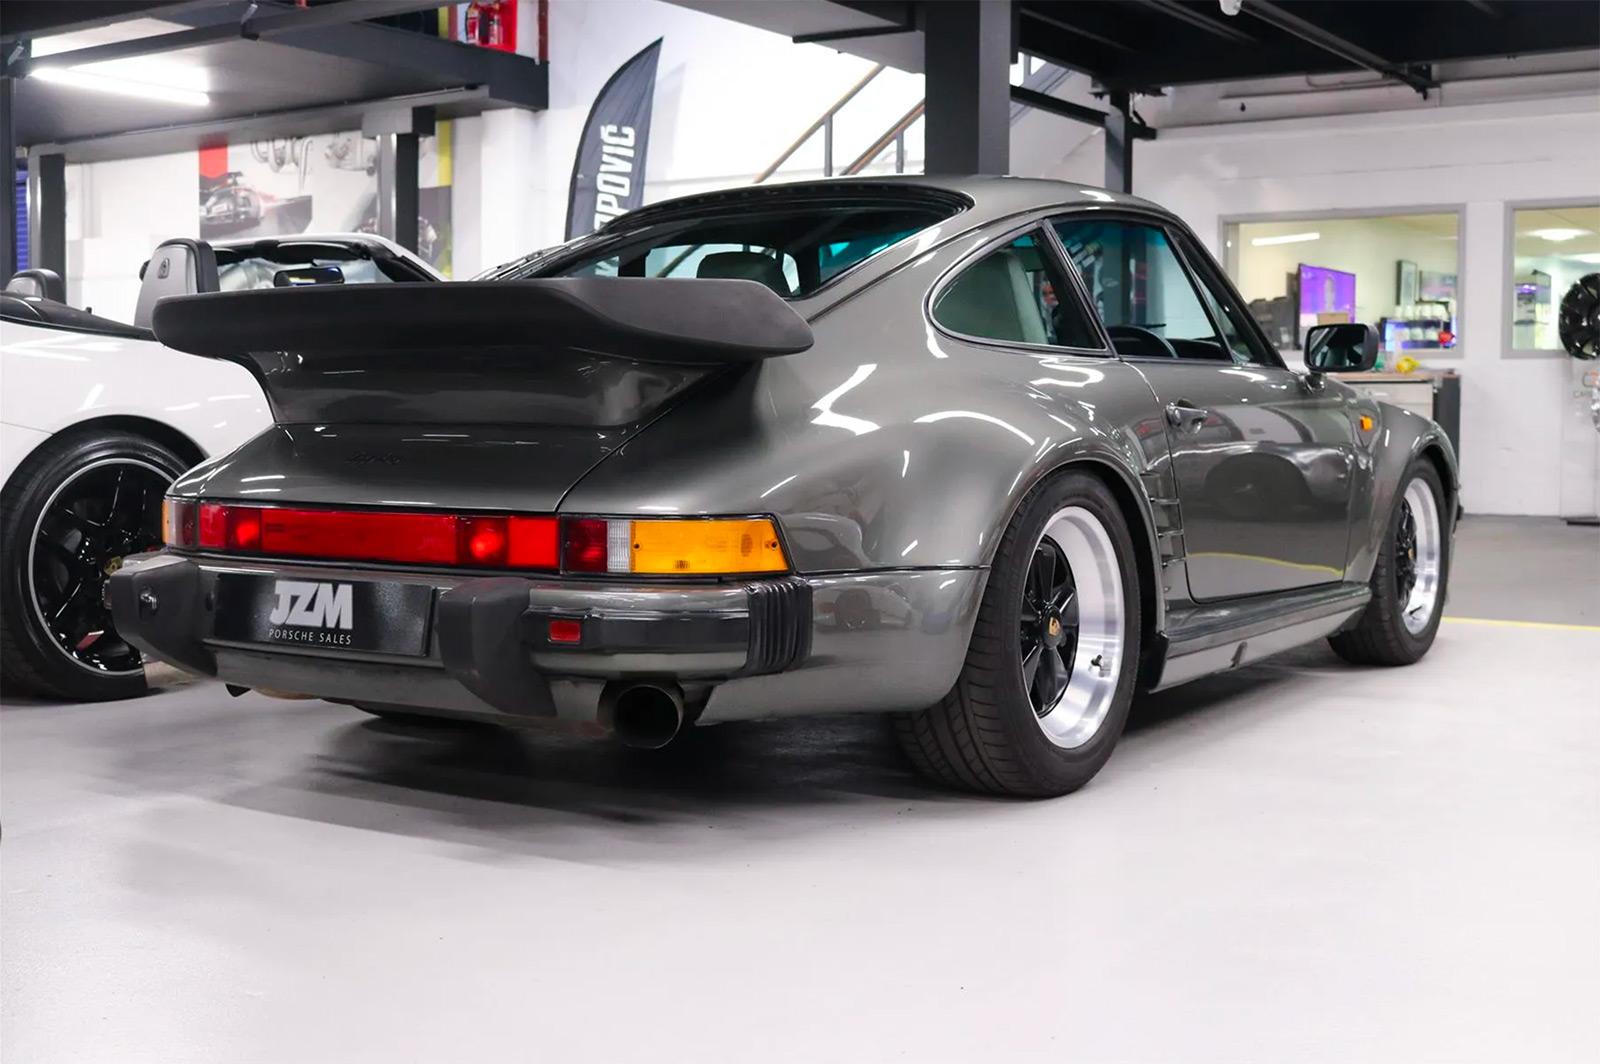 Porsche 911 Turbo SE Flat Nose